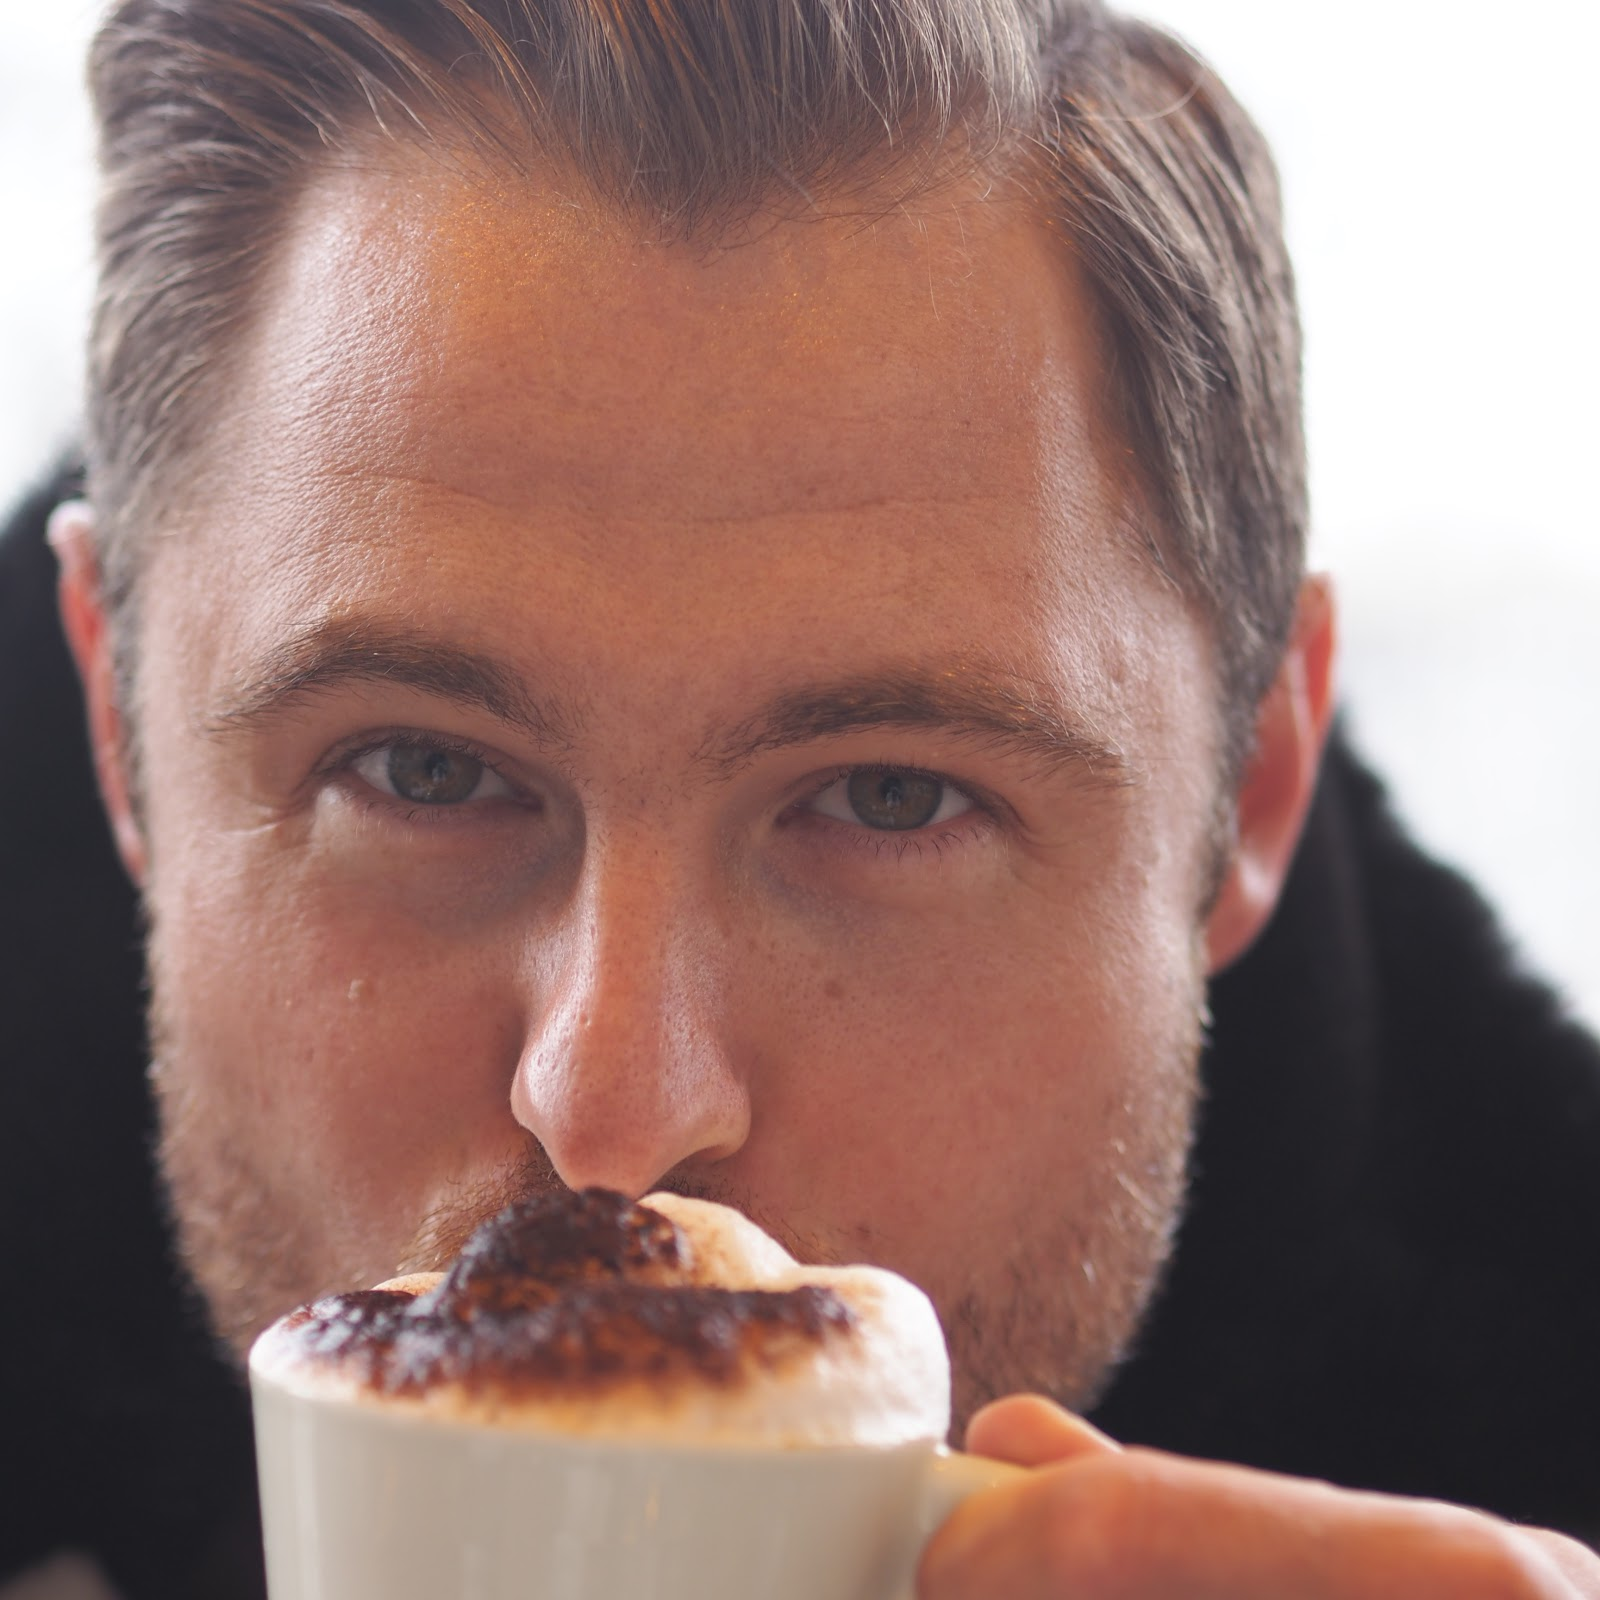 Man drinking Cappuccino